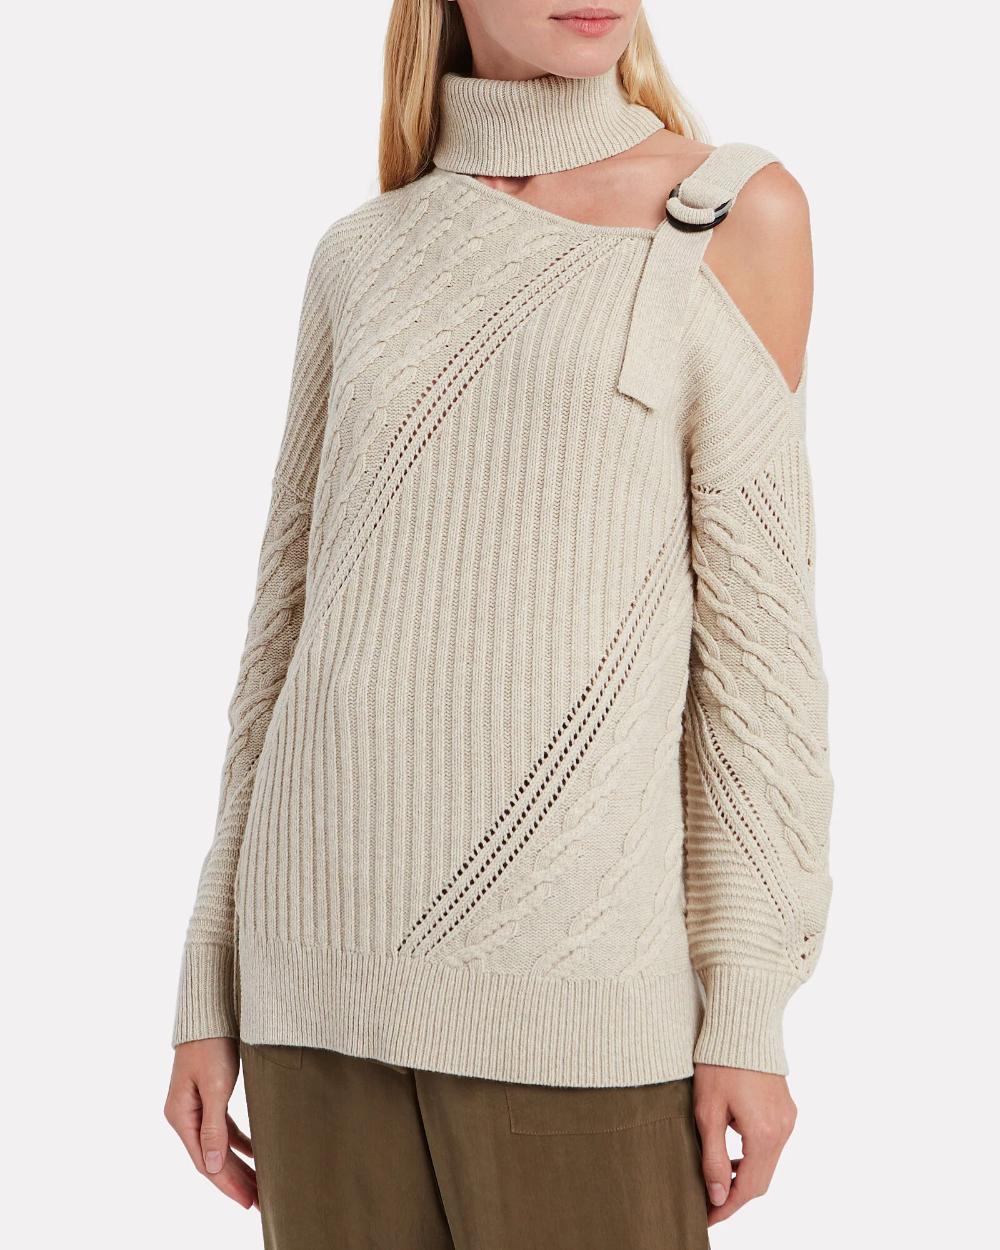 Strapped Merino Turtleneck Sweater